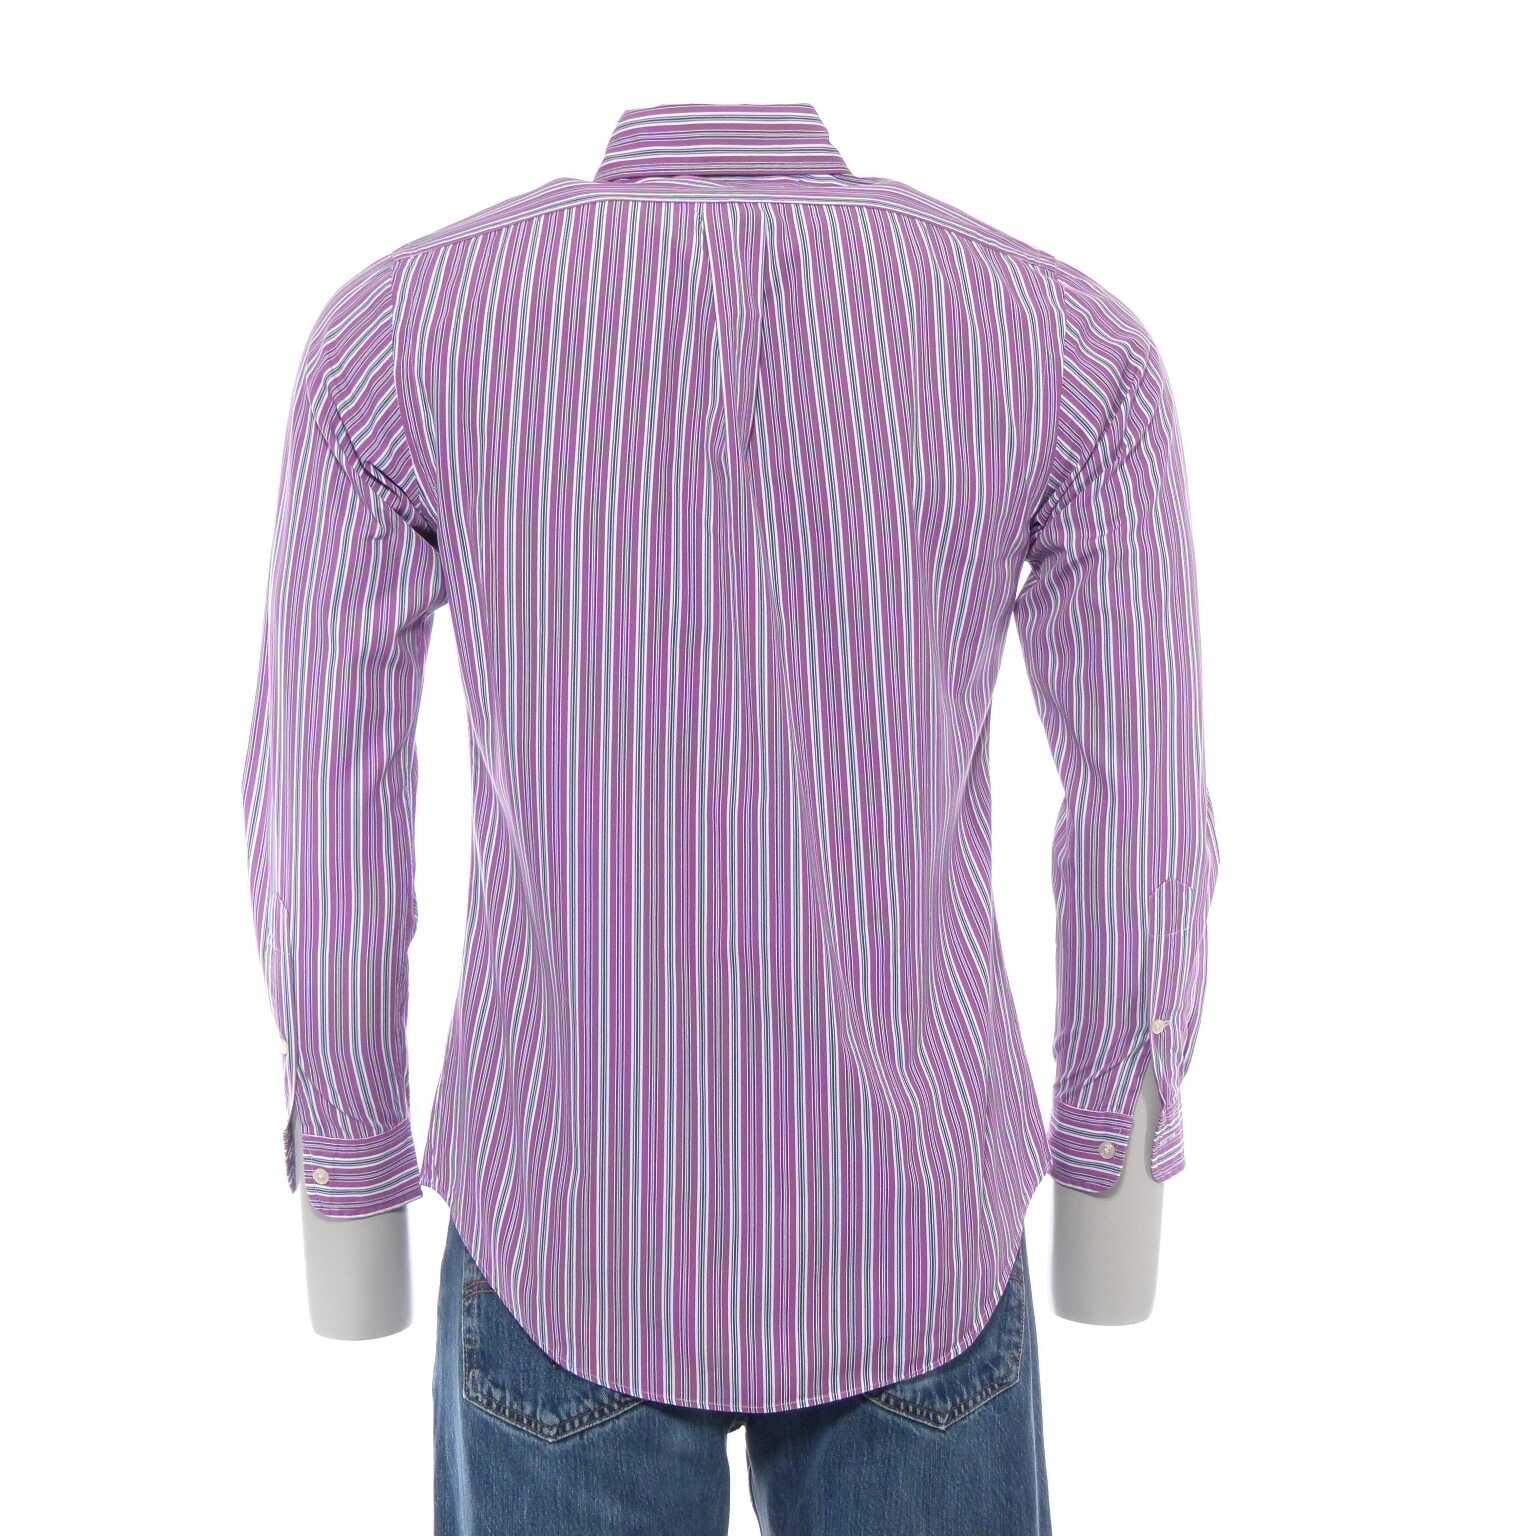 ralph lauren custom fit hemd gr s in purpur lila wei. Black Bedroom Furniture Sets. Home Design Ideas